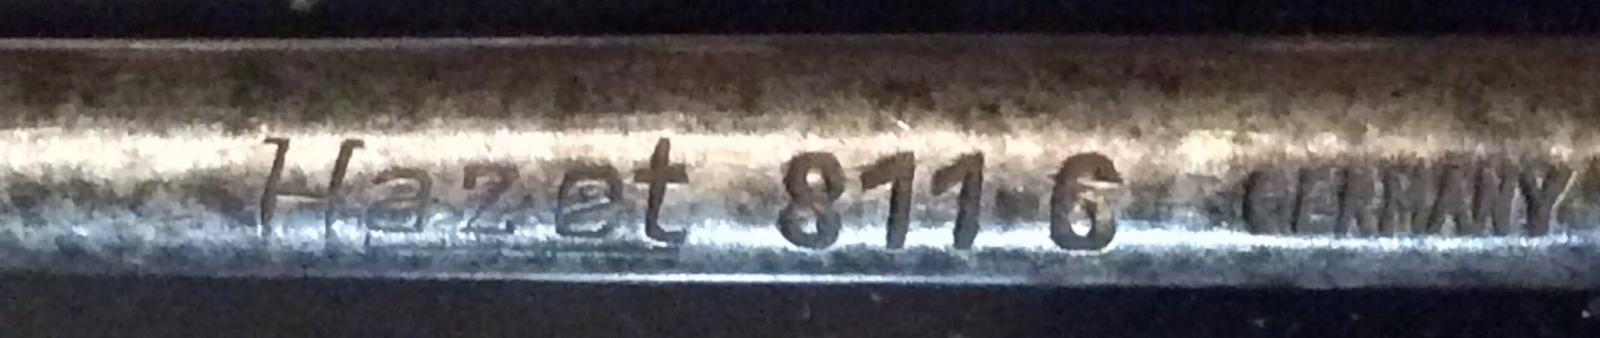 Hazet 811-6 Screw Driver Differences.